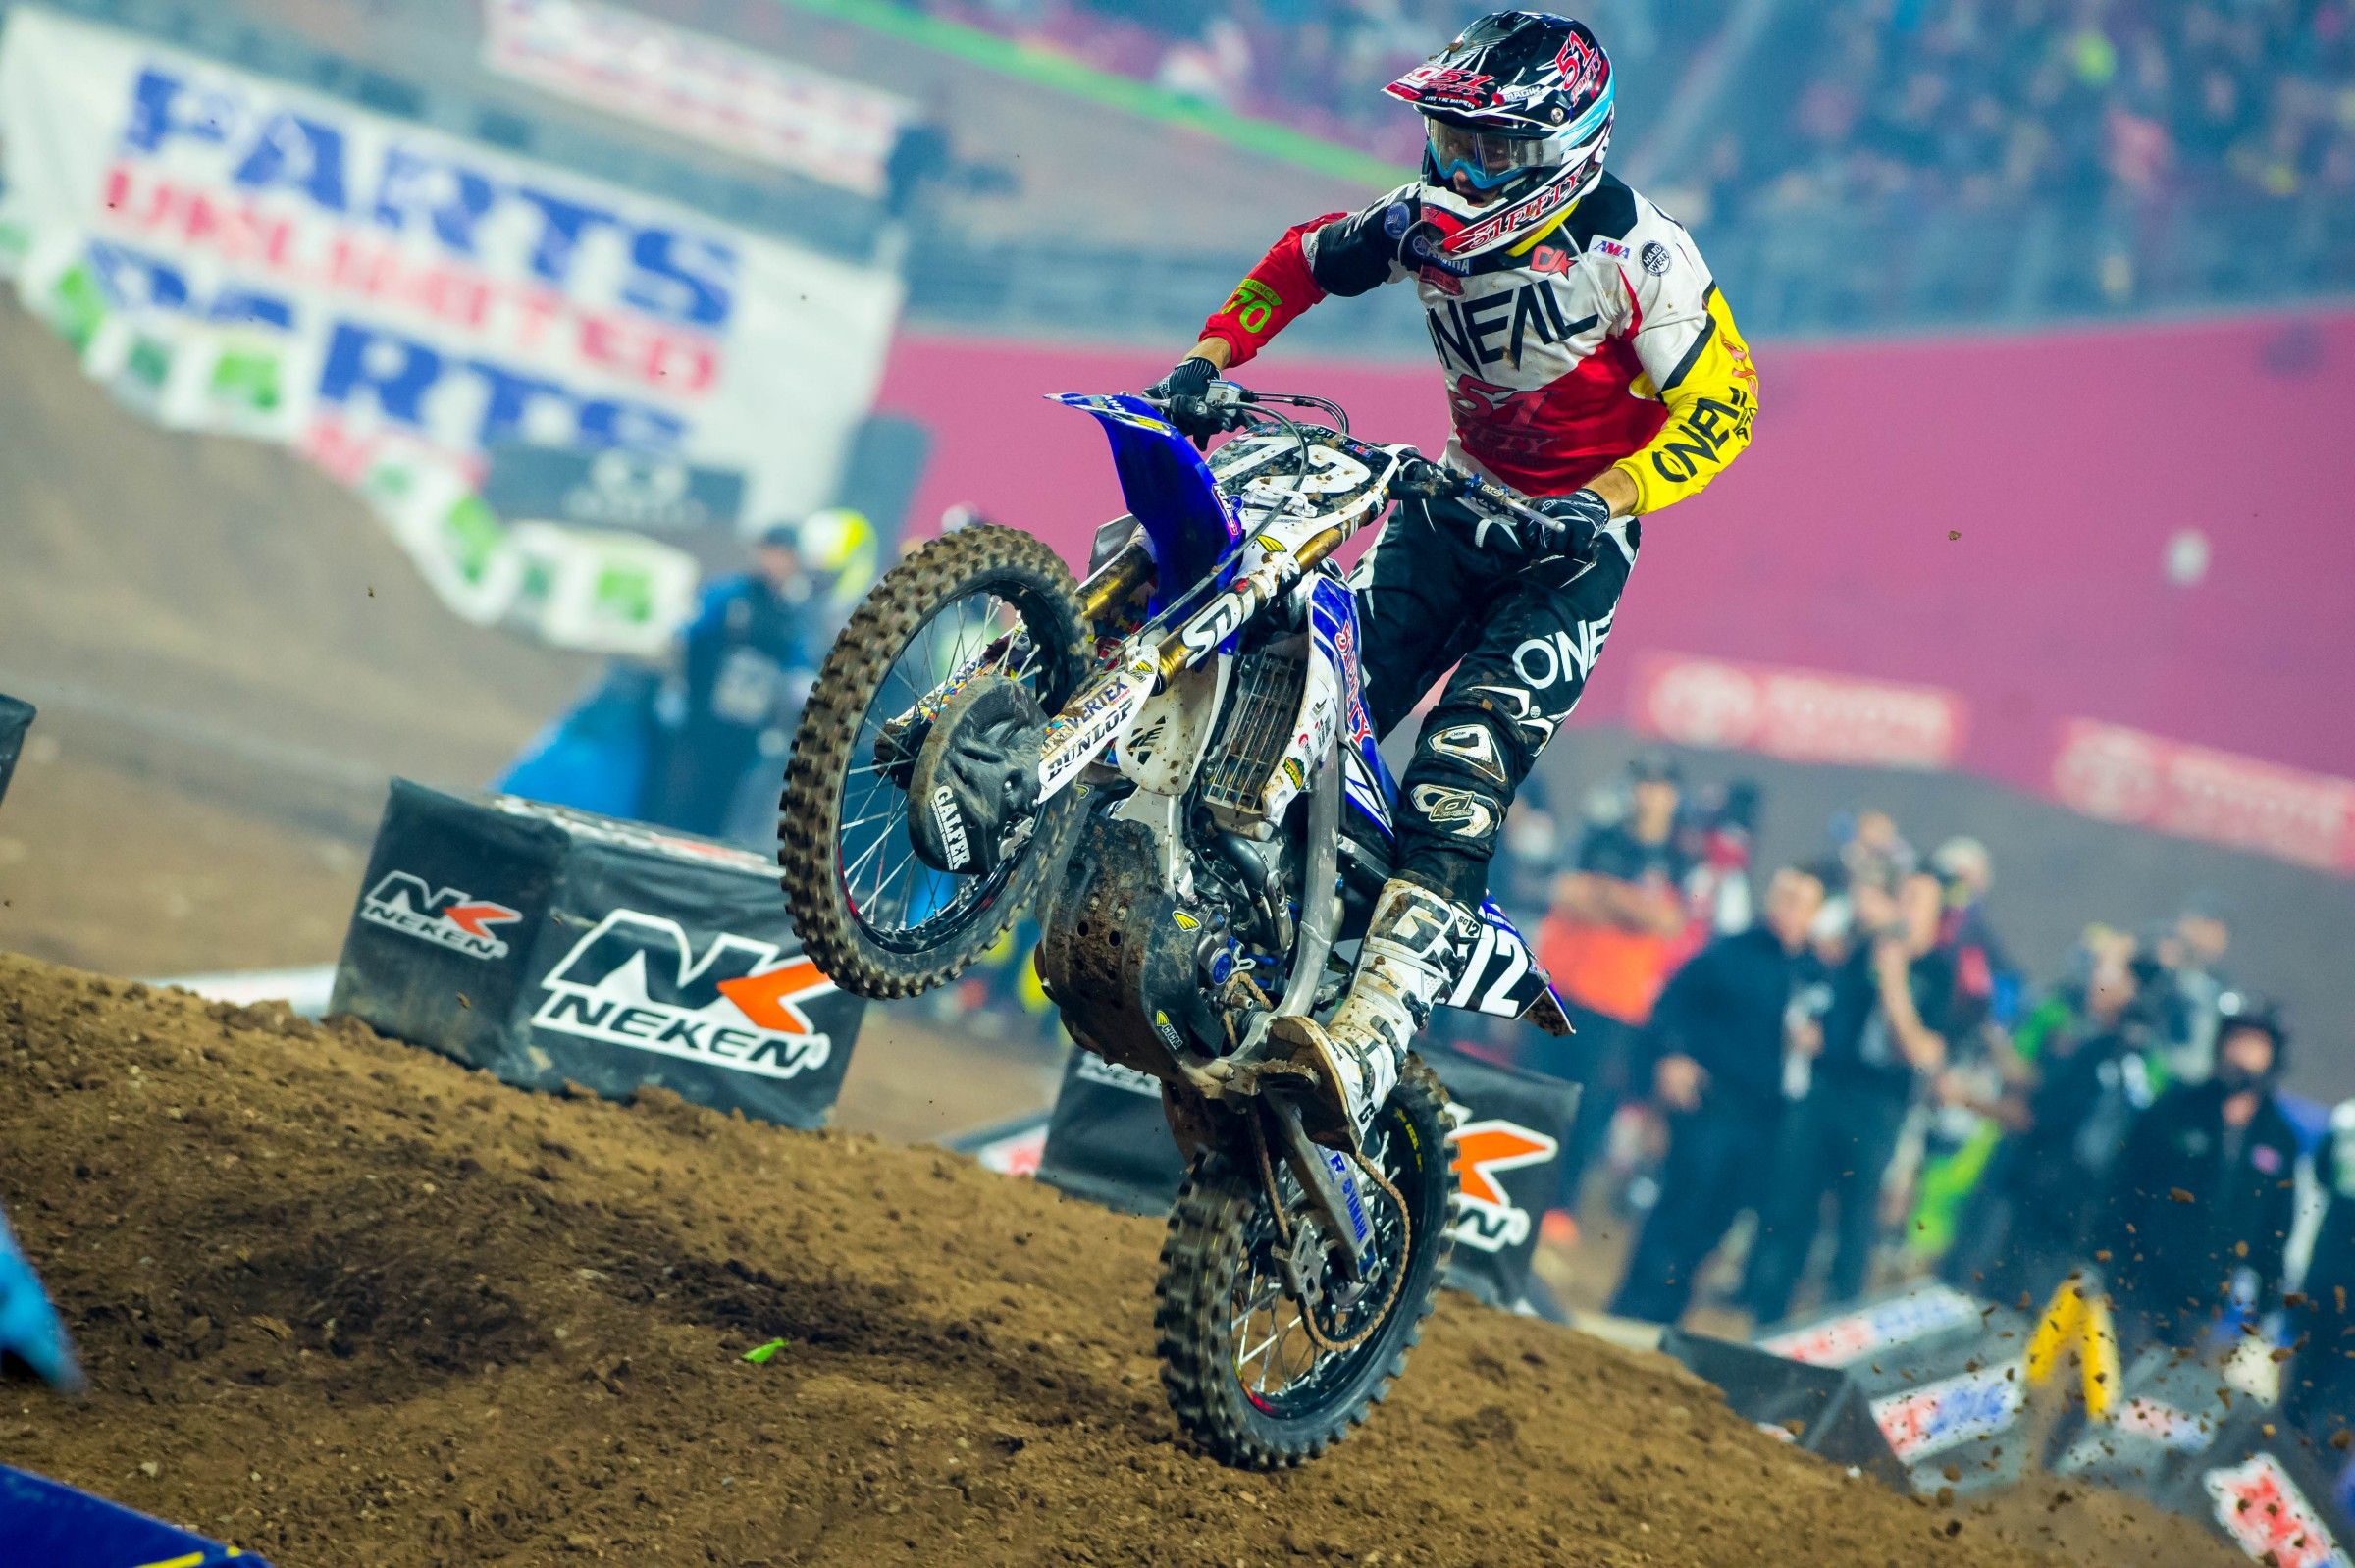 Privateer Profile: Hayden Mellross - Supercross